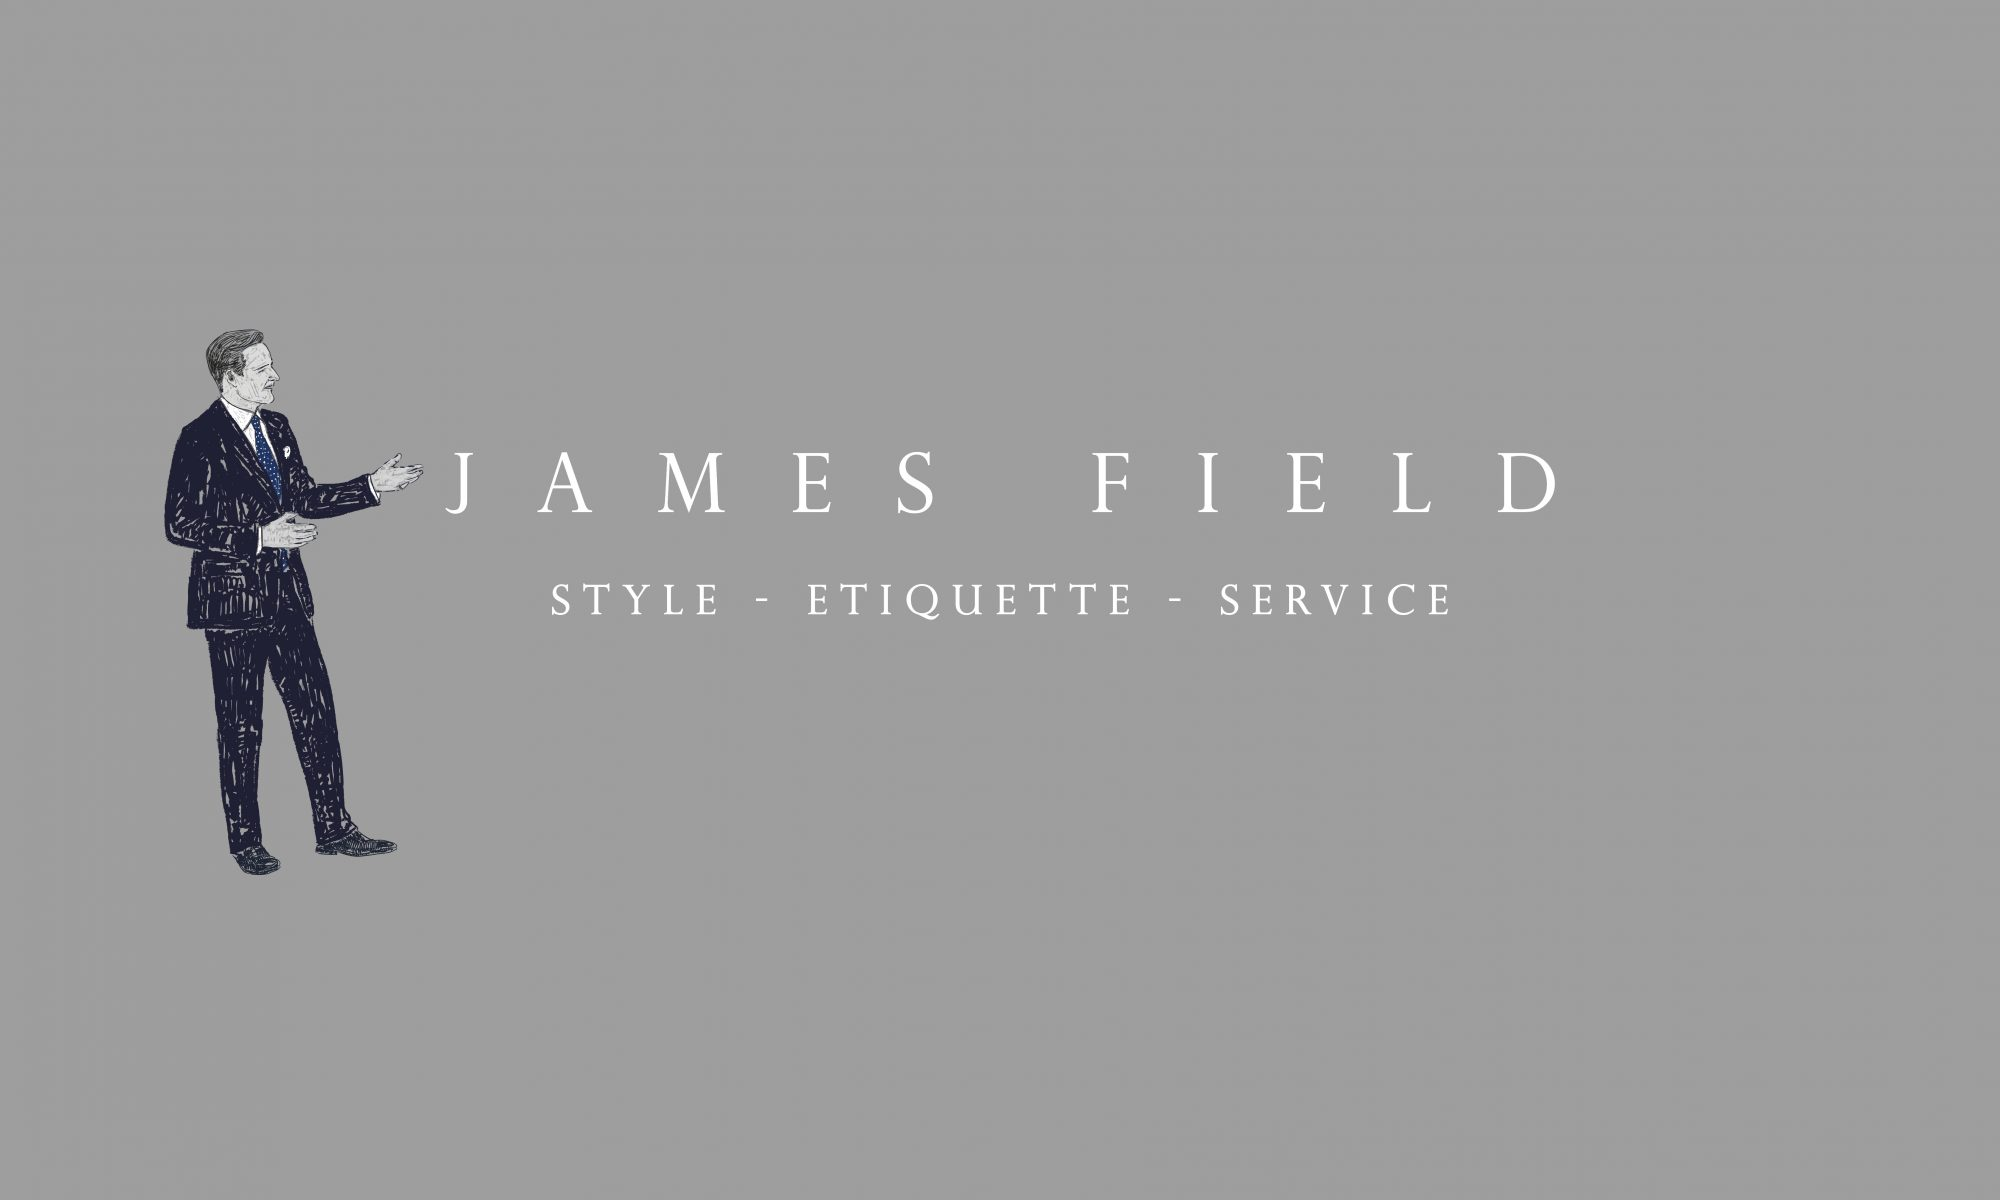 JAMES FIELD